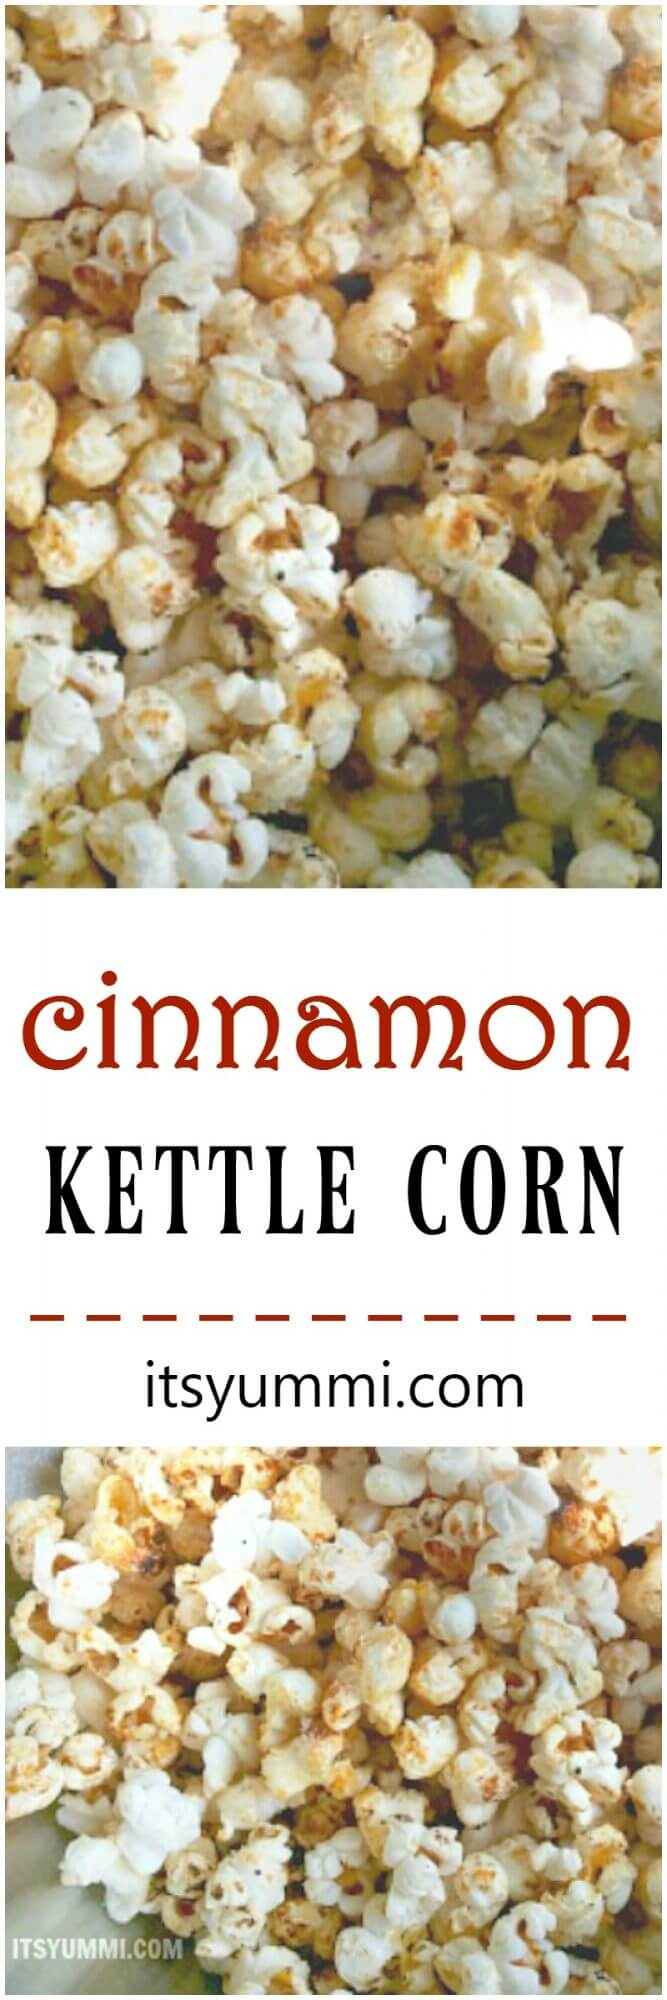 Cinnamon Kettle Corn - a sweet, salty, delicious snack recipe on itsyummi.com